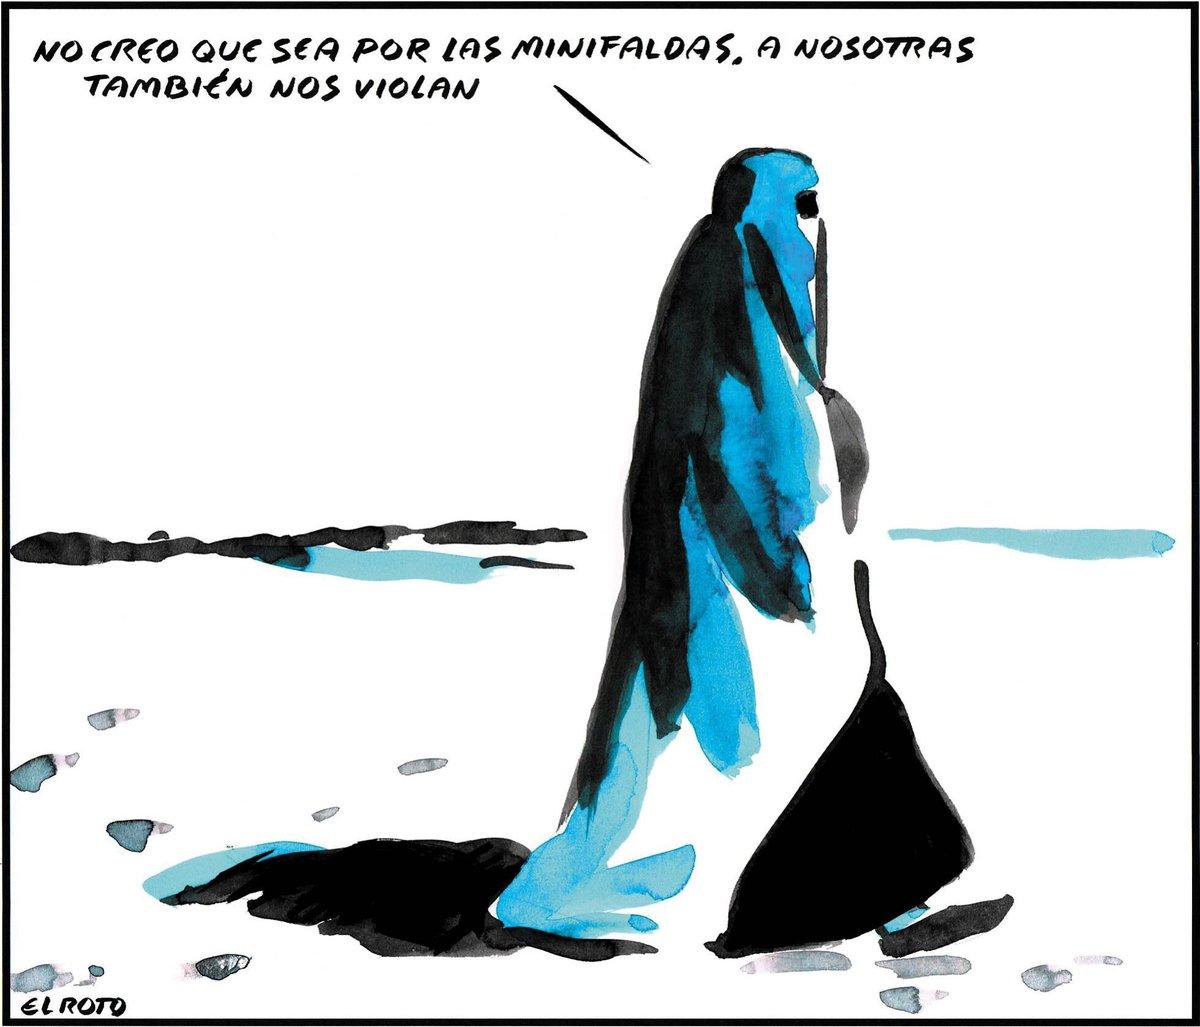 RT @MonicaCarrillo: Brutal.  #ElRoto https://t.co/JX8QrLhDMb